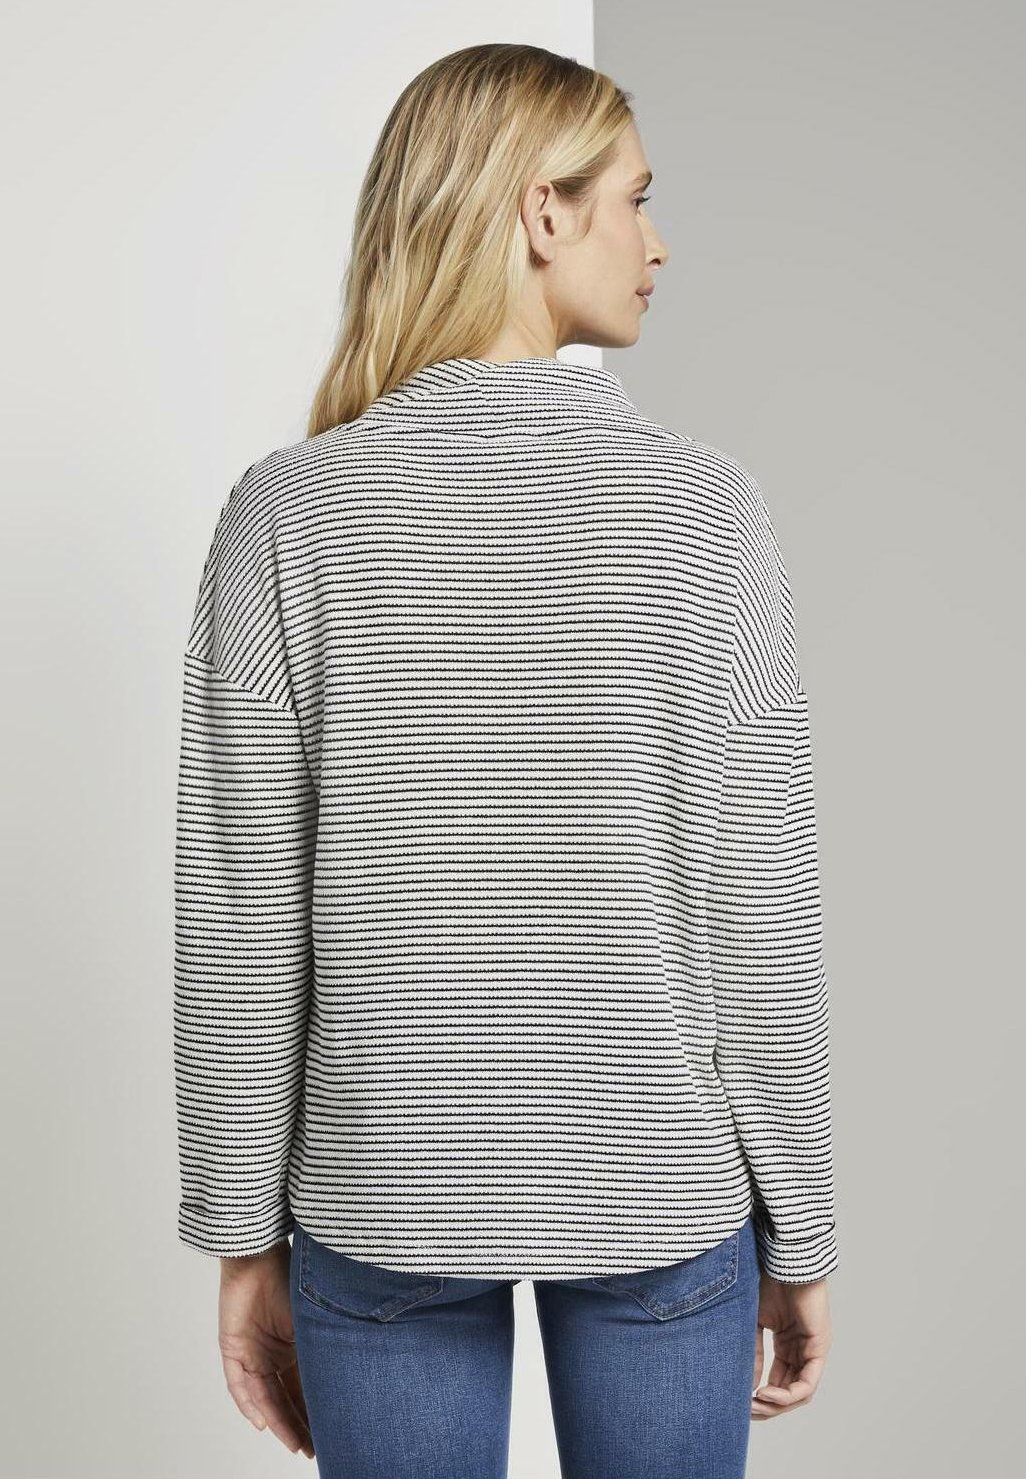 TOM TAILOR Sweater - offwhite/black - Dames jas Ontwerper